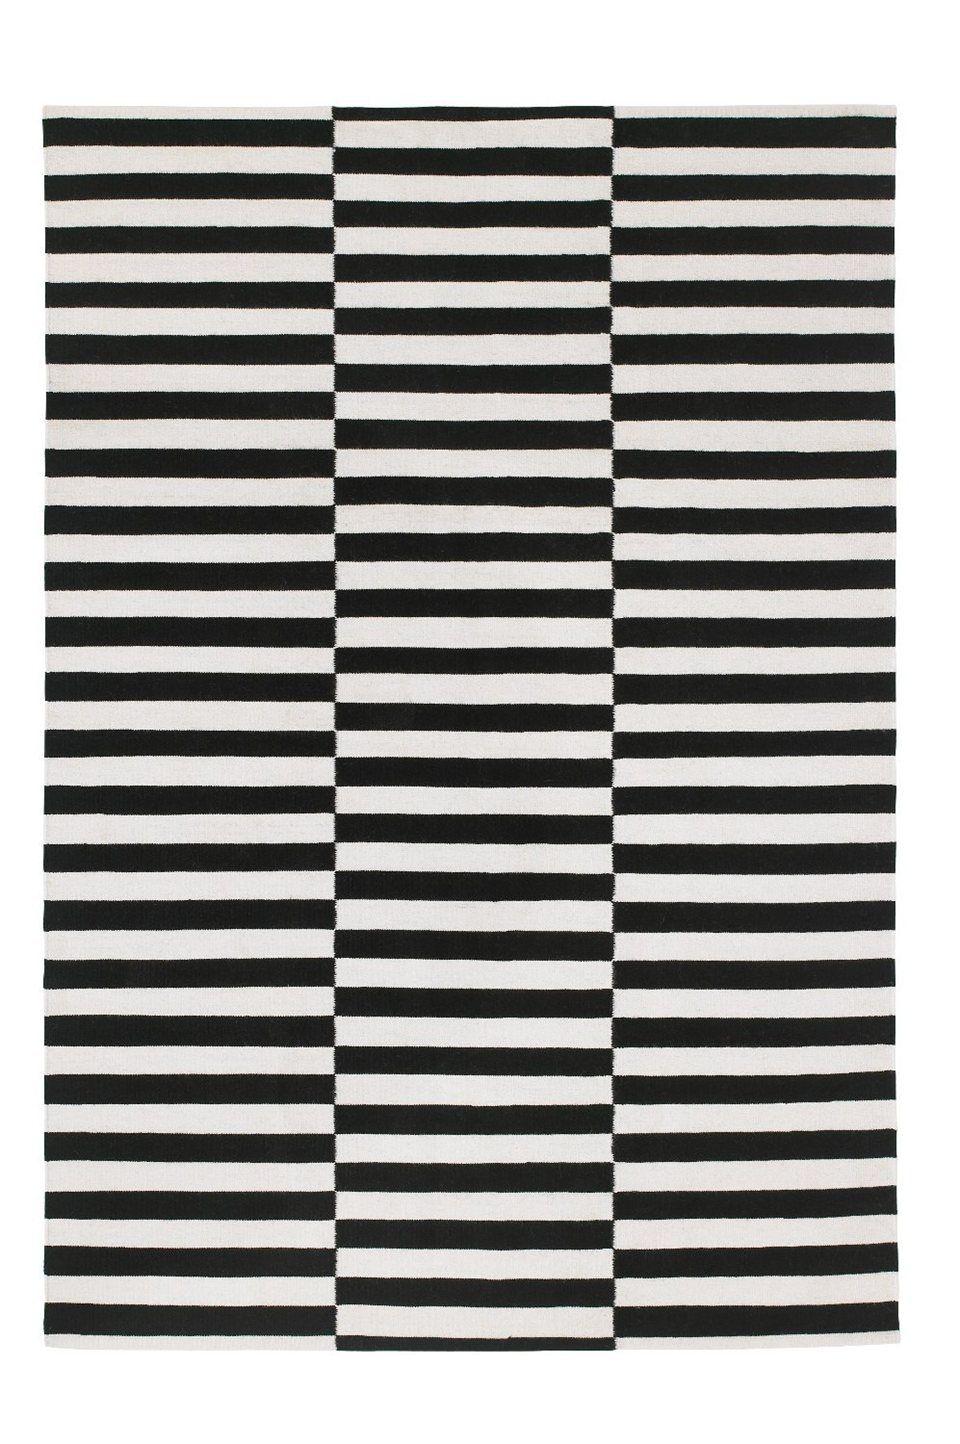 ikea stockholm rand vloerkleed glad geweven 269 250x350 cm zwart ecru. Black Bedroom Furniture Sets. Home Design Ideas